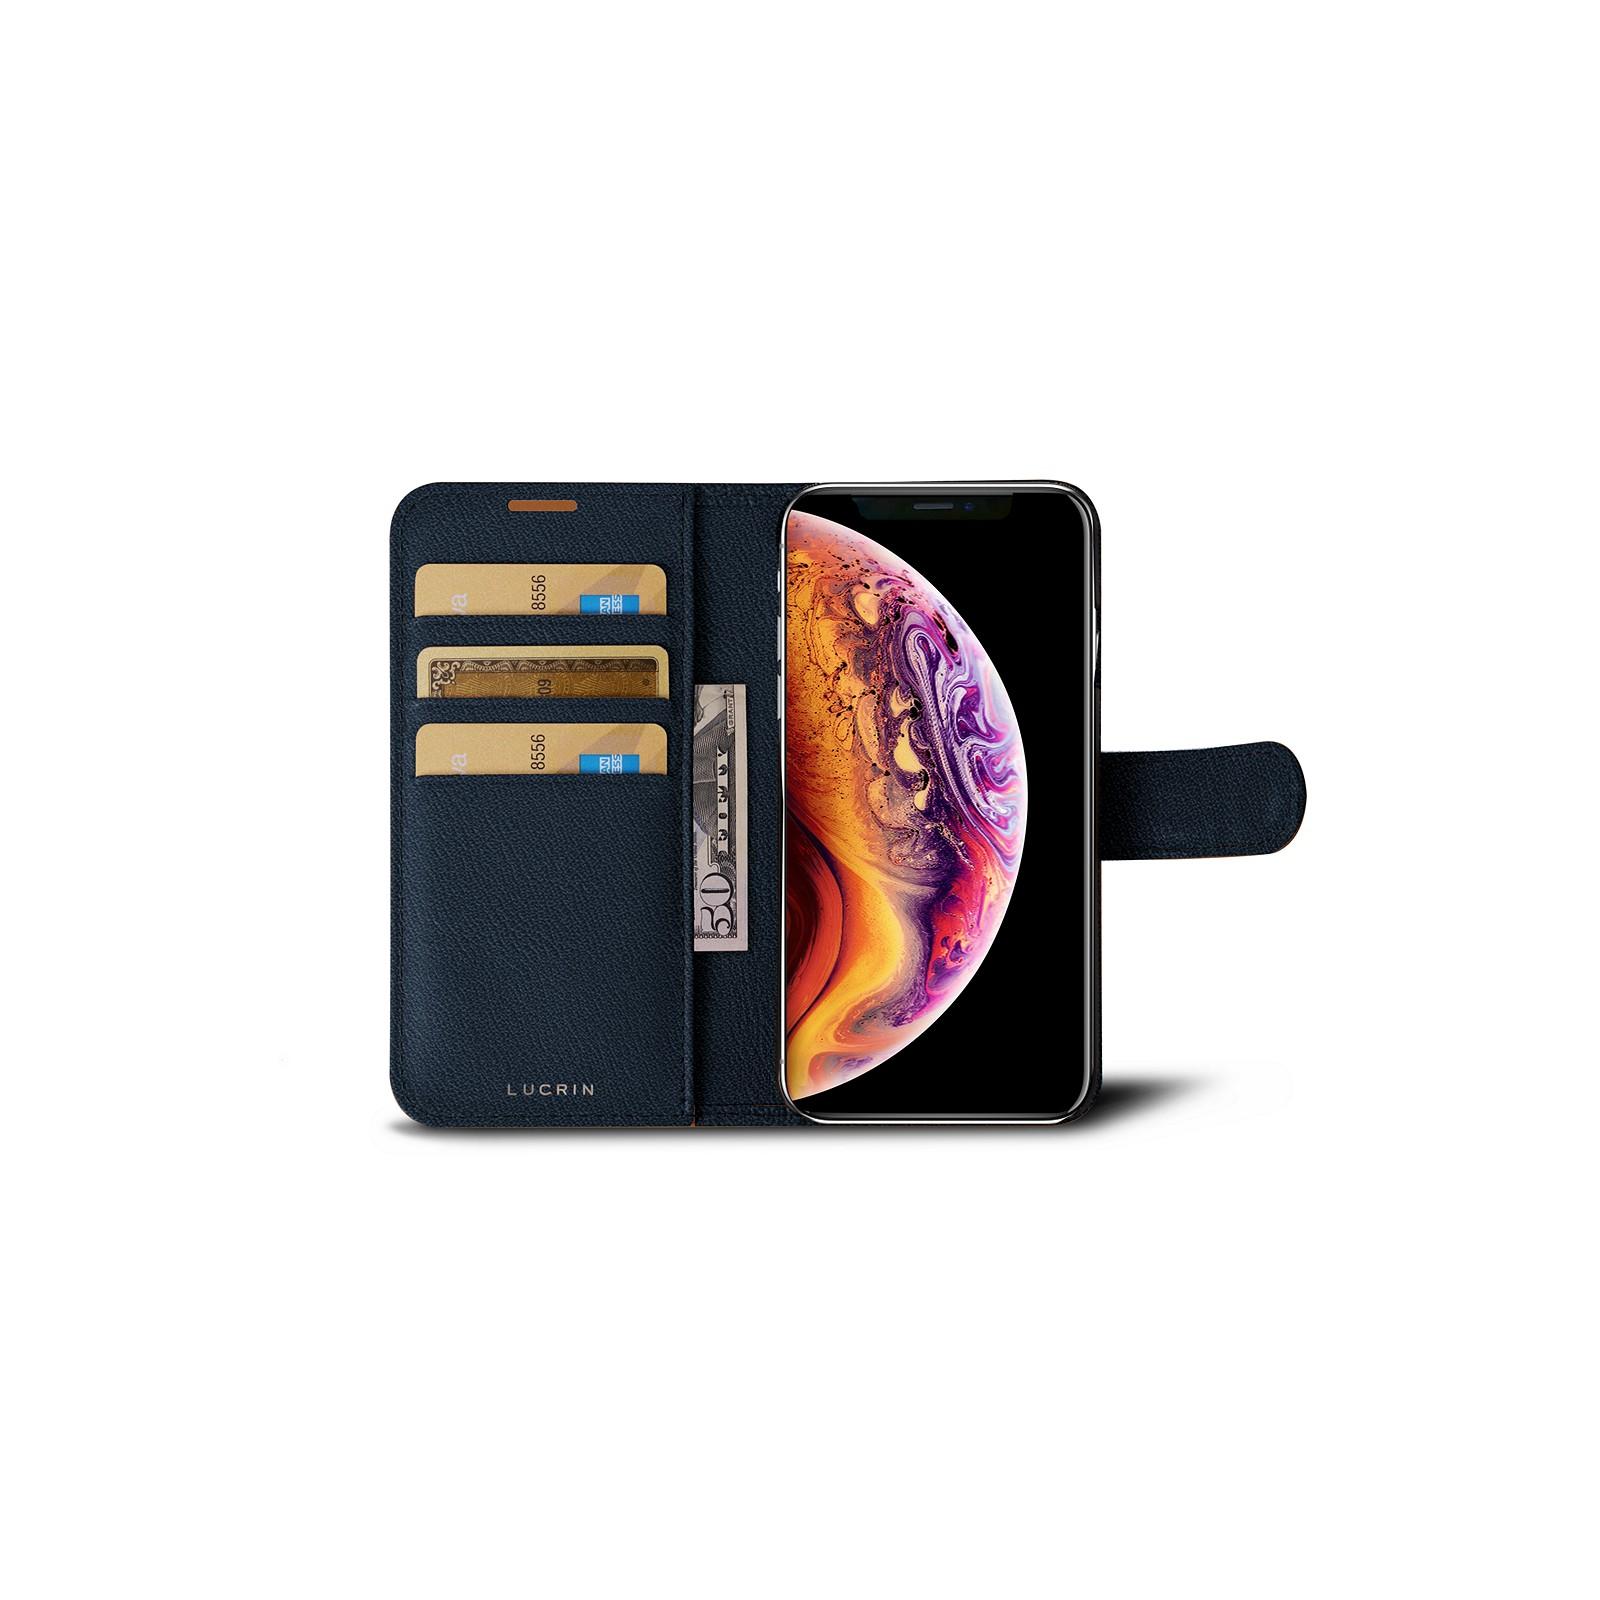 lucrin iphone x case